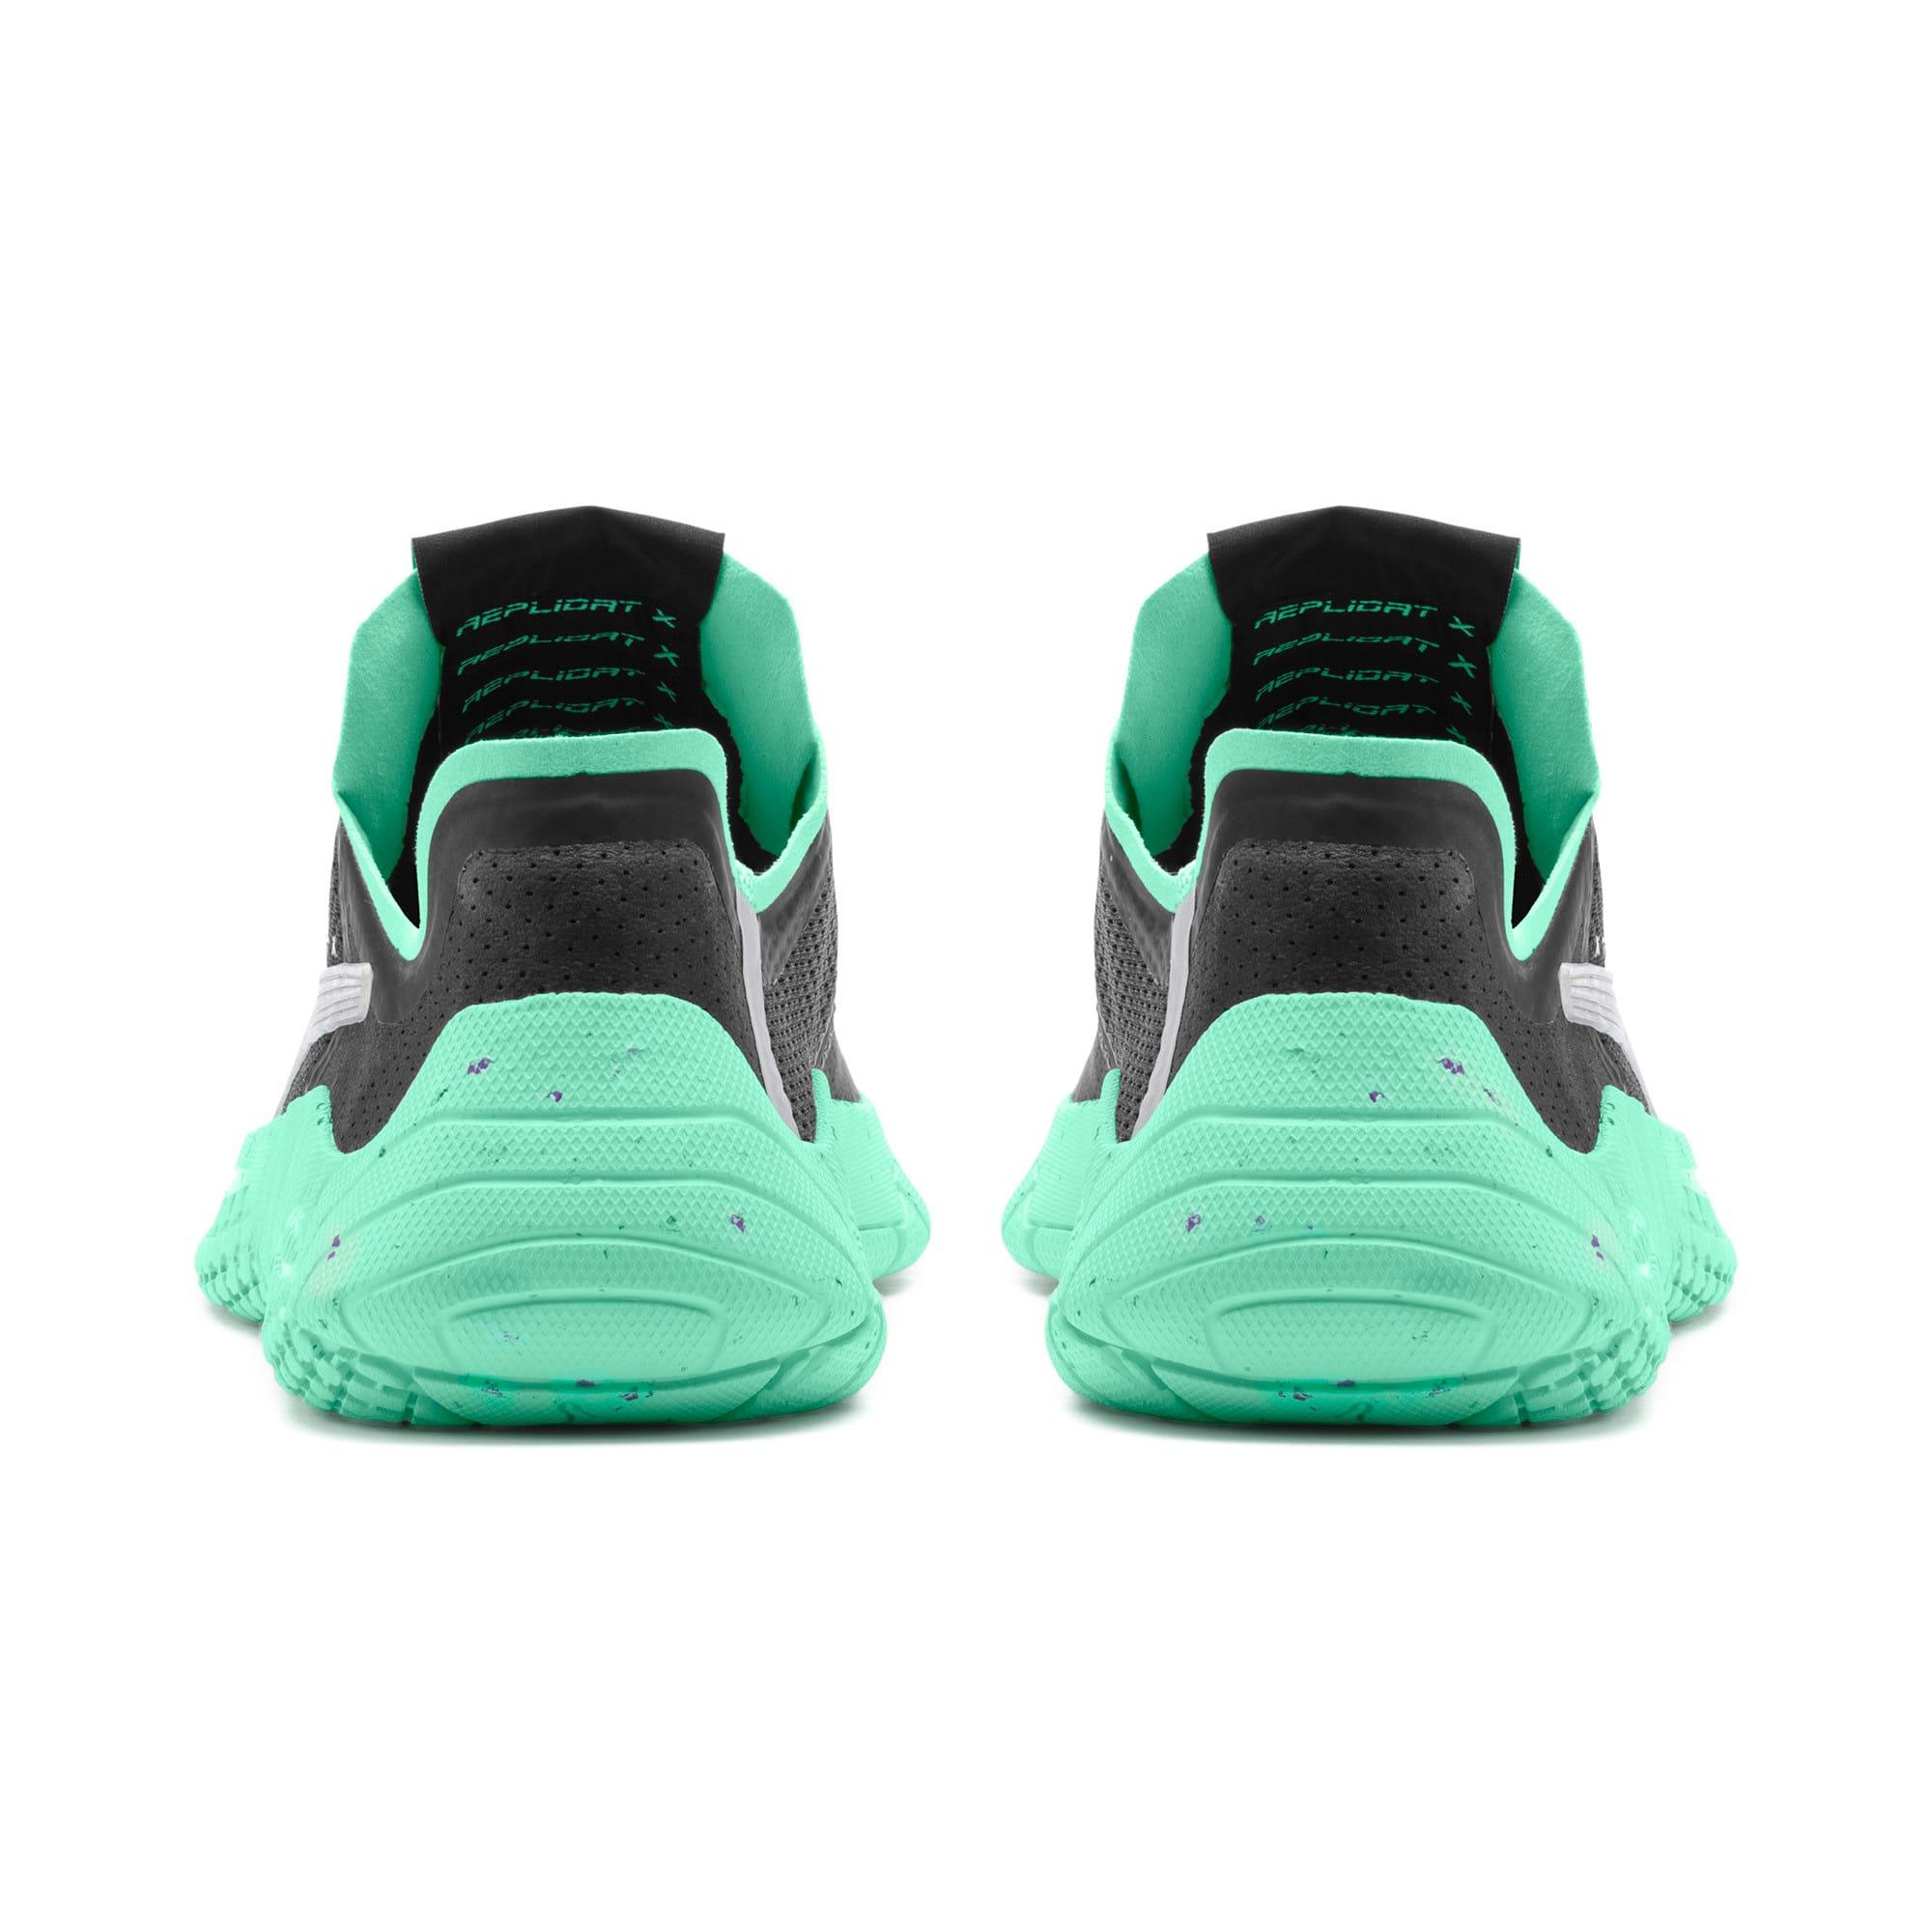 Thumbnail 3 of Replicat-X Fluro Sneaker, Black-Green Glimmer-Silver, medium